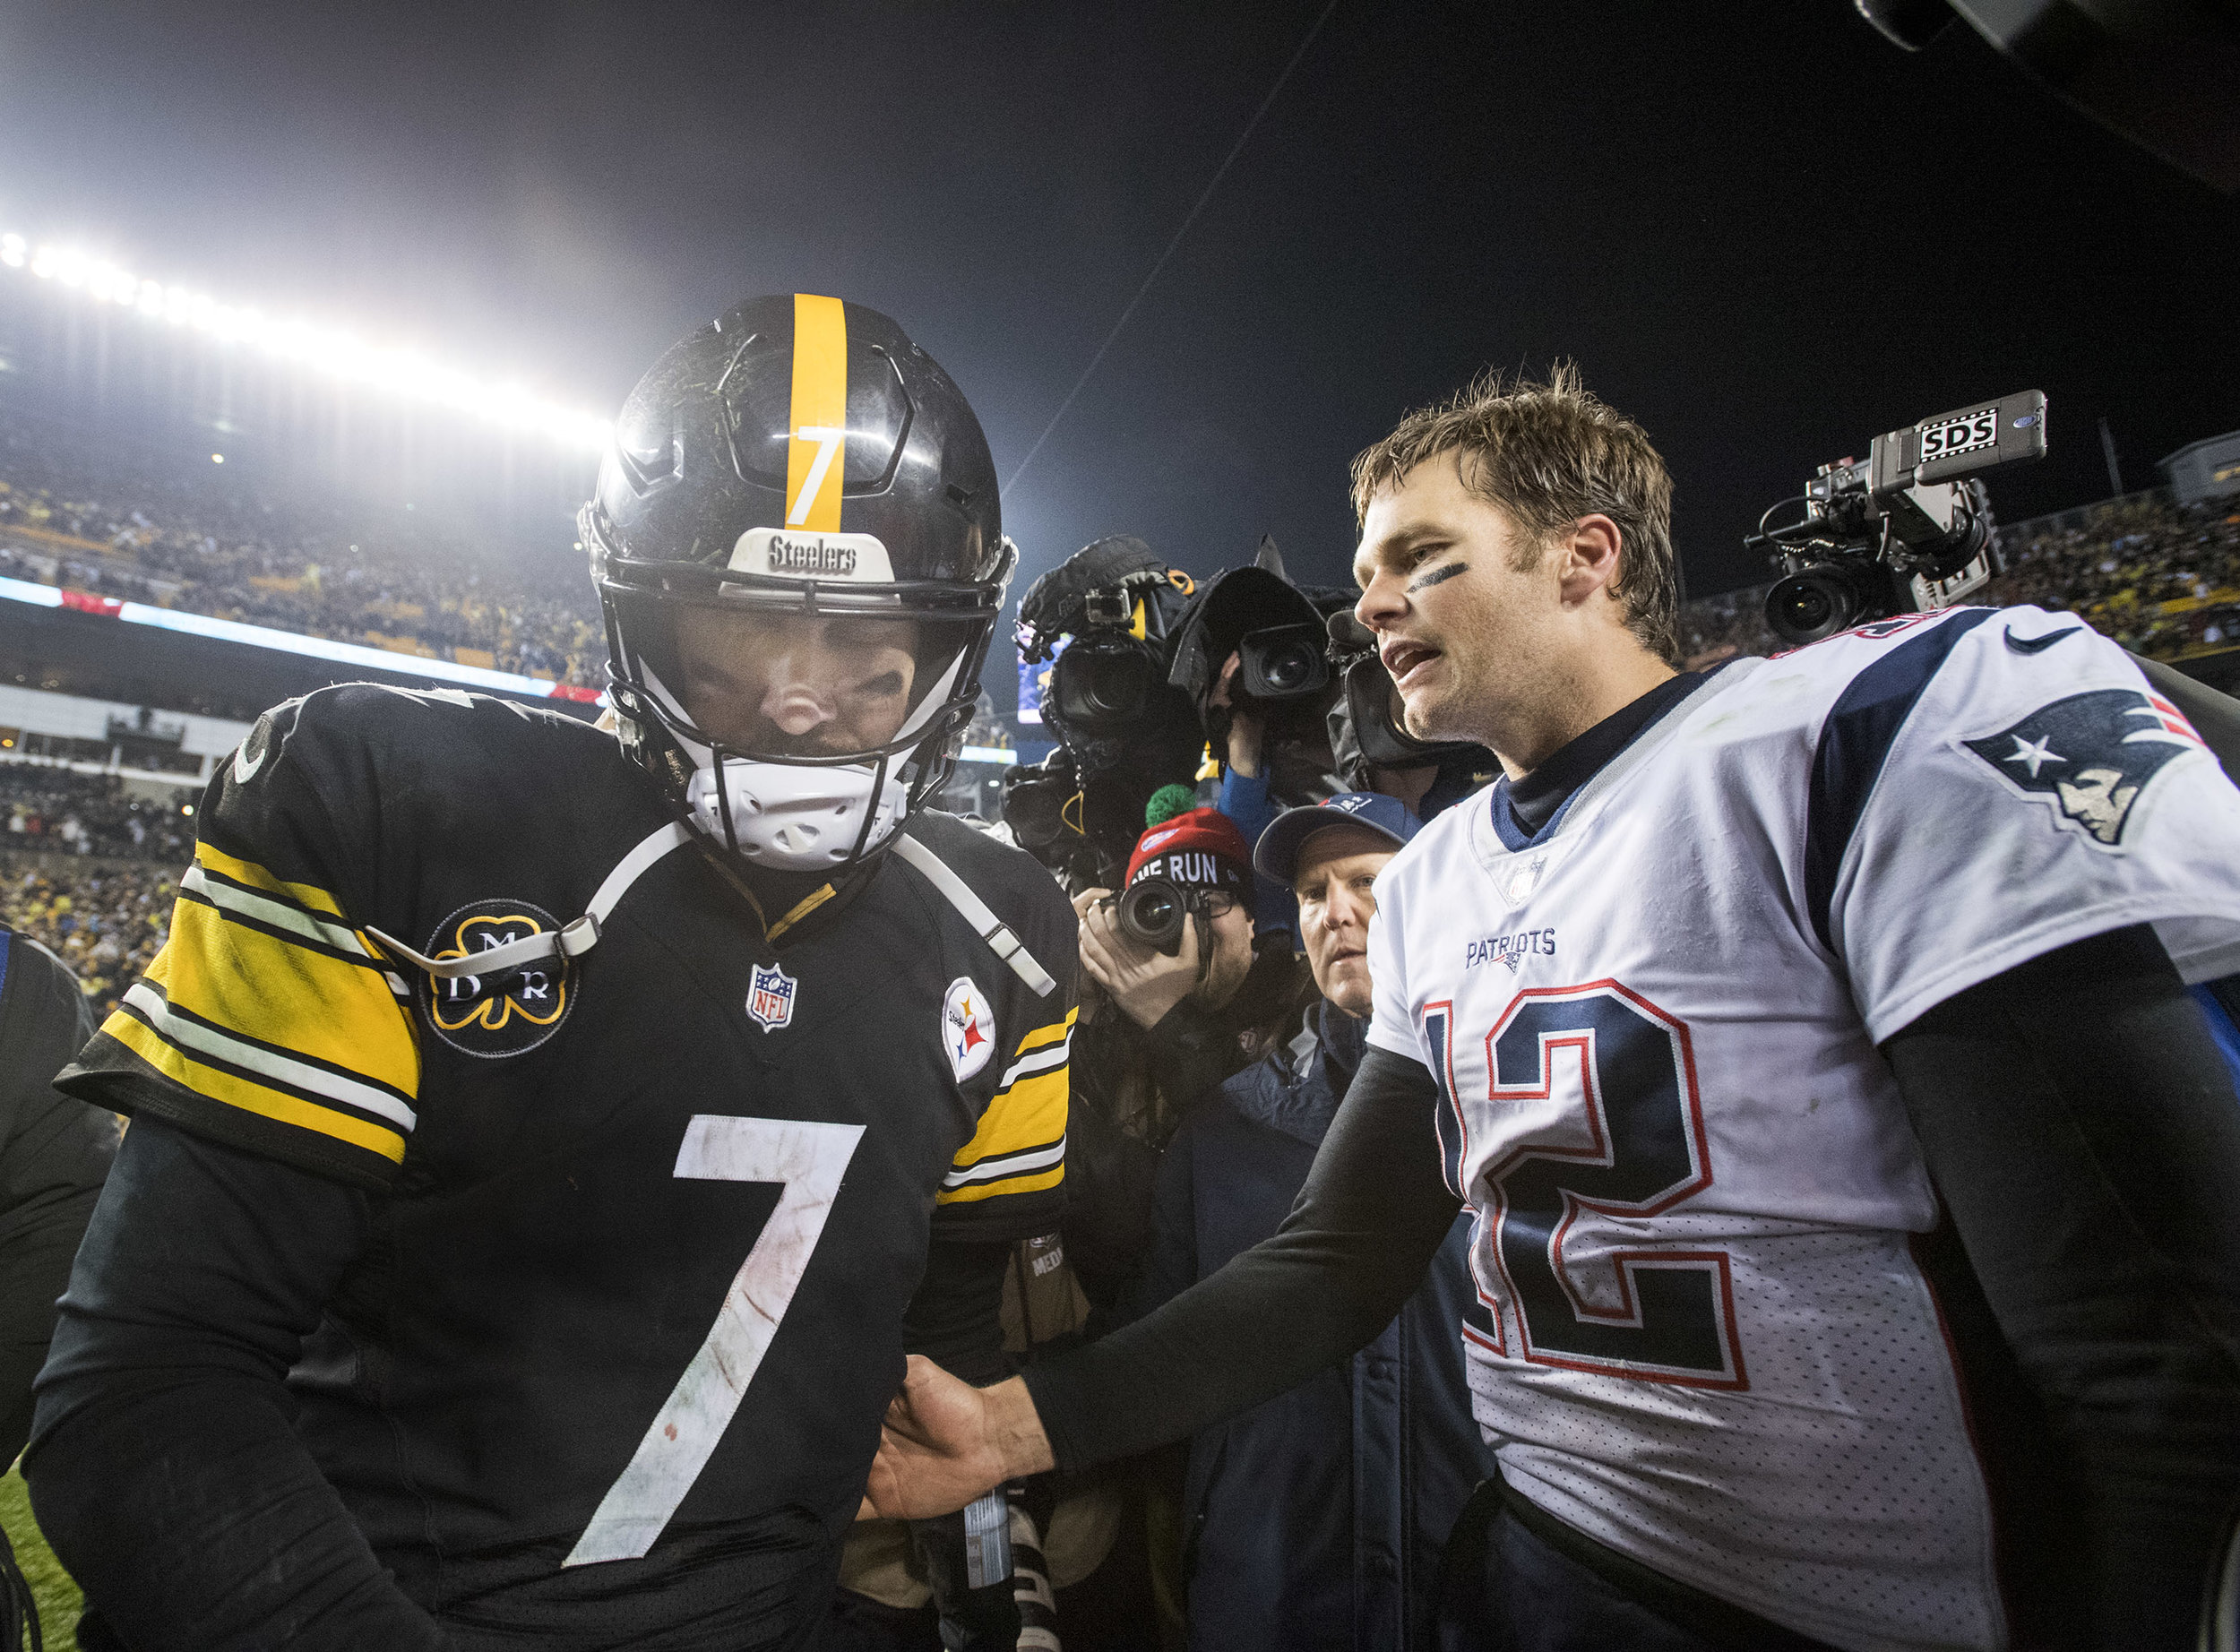 Pittsburgh Steelers quarterback Ben Roethlisberger walks away dejected after congratulating New England Patriots quarterback Tom Brady on Sunday, Dec. 17, 2017 at Heinz Field in Pittsburgh. (Steph Chambers/Post-Gazette)